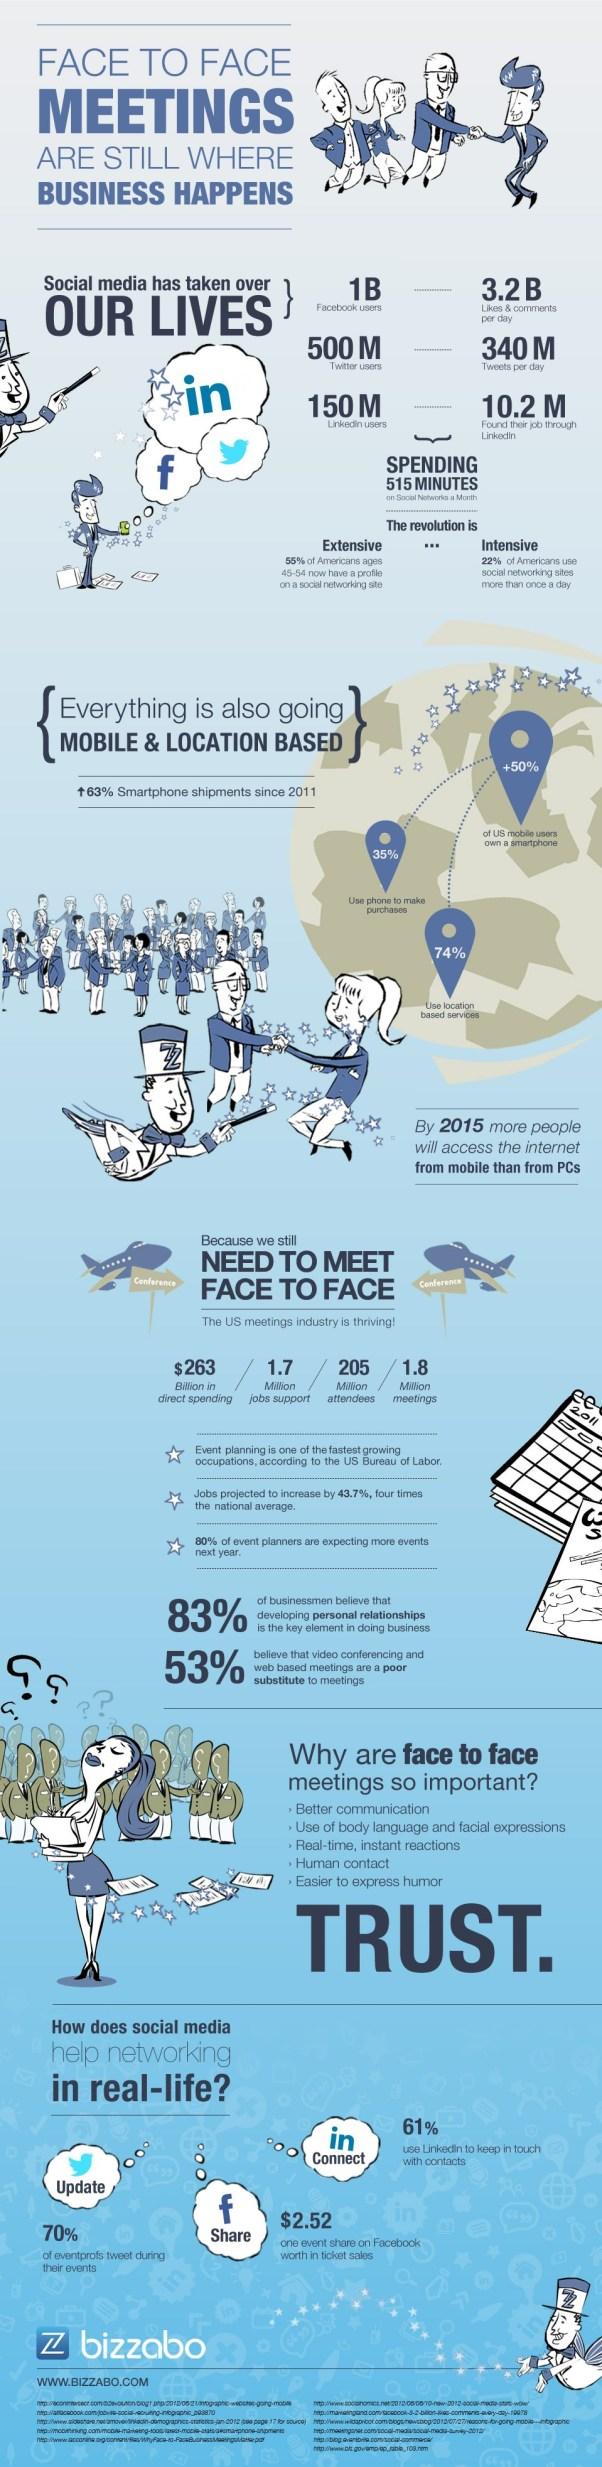 Bizzabo_Infographic